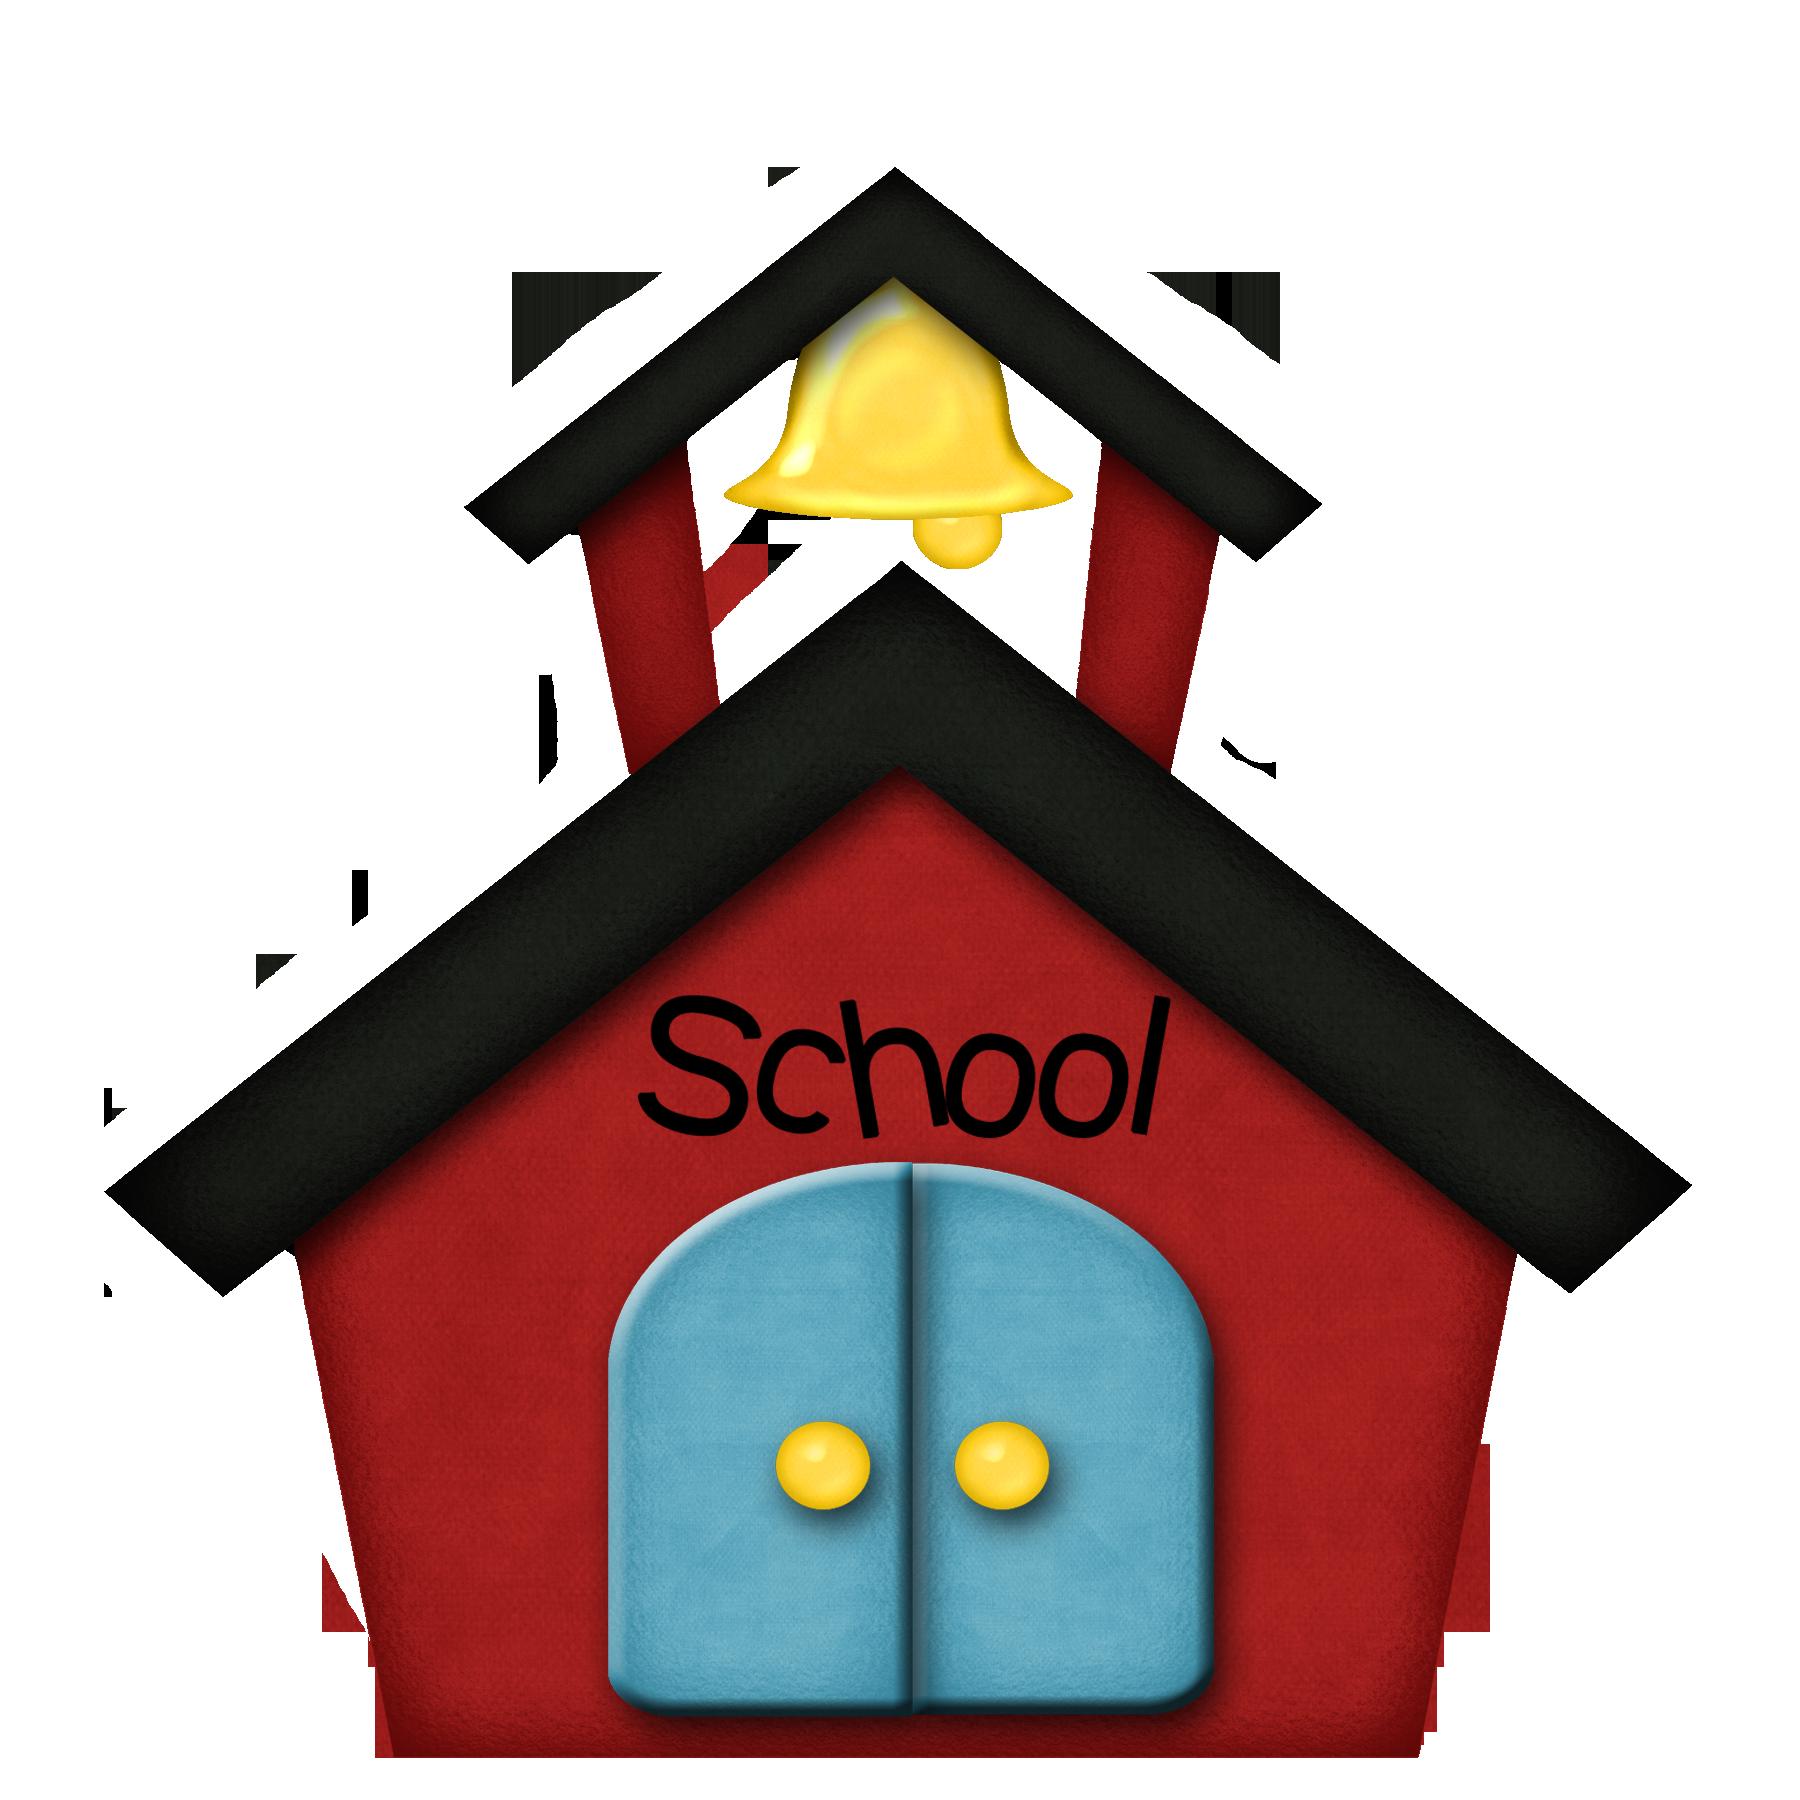 School Building Clipart Png.